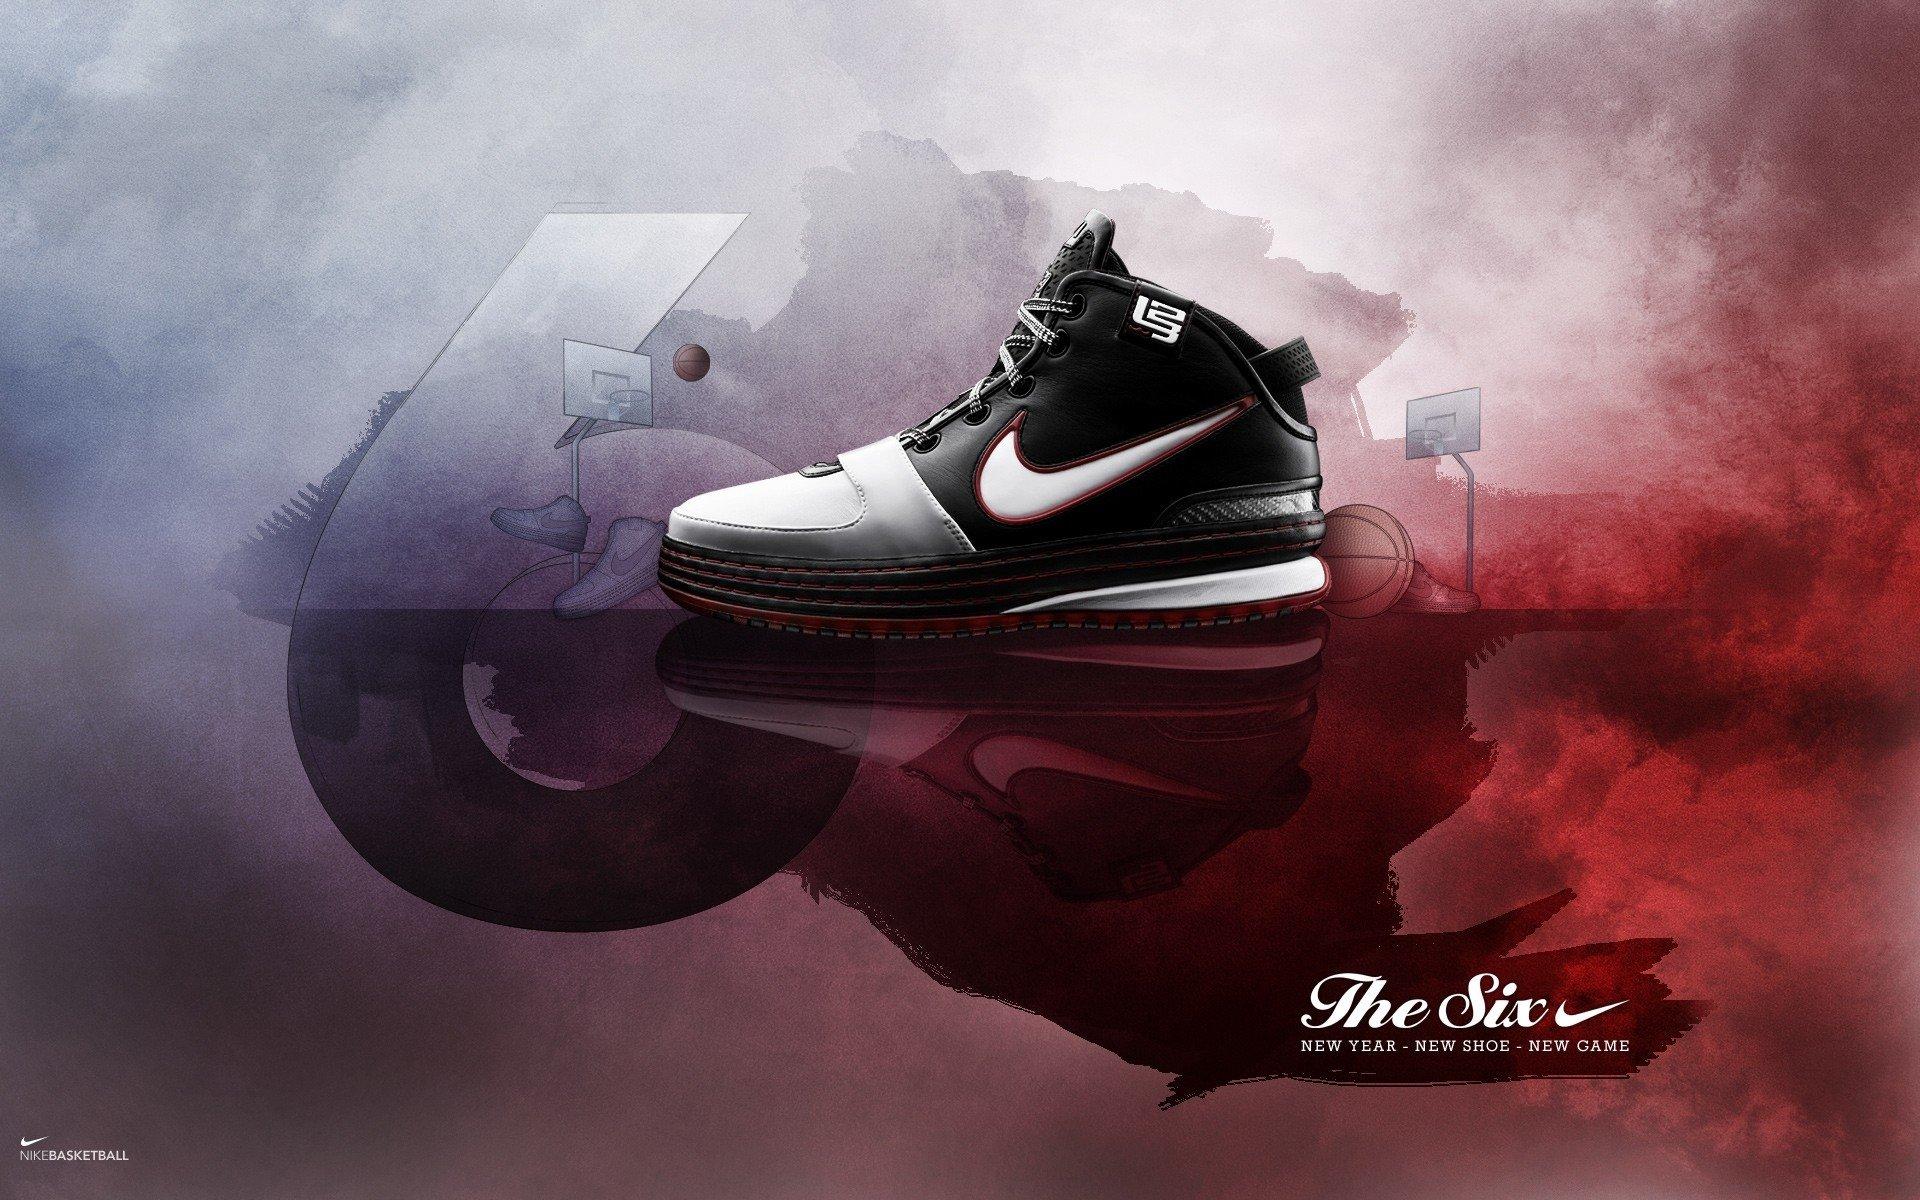 Nike Hd Wallpaper Background Image 1920x1200 Id 304150